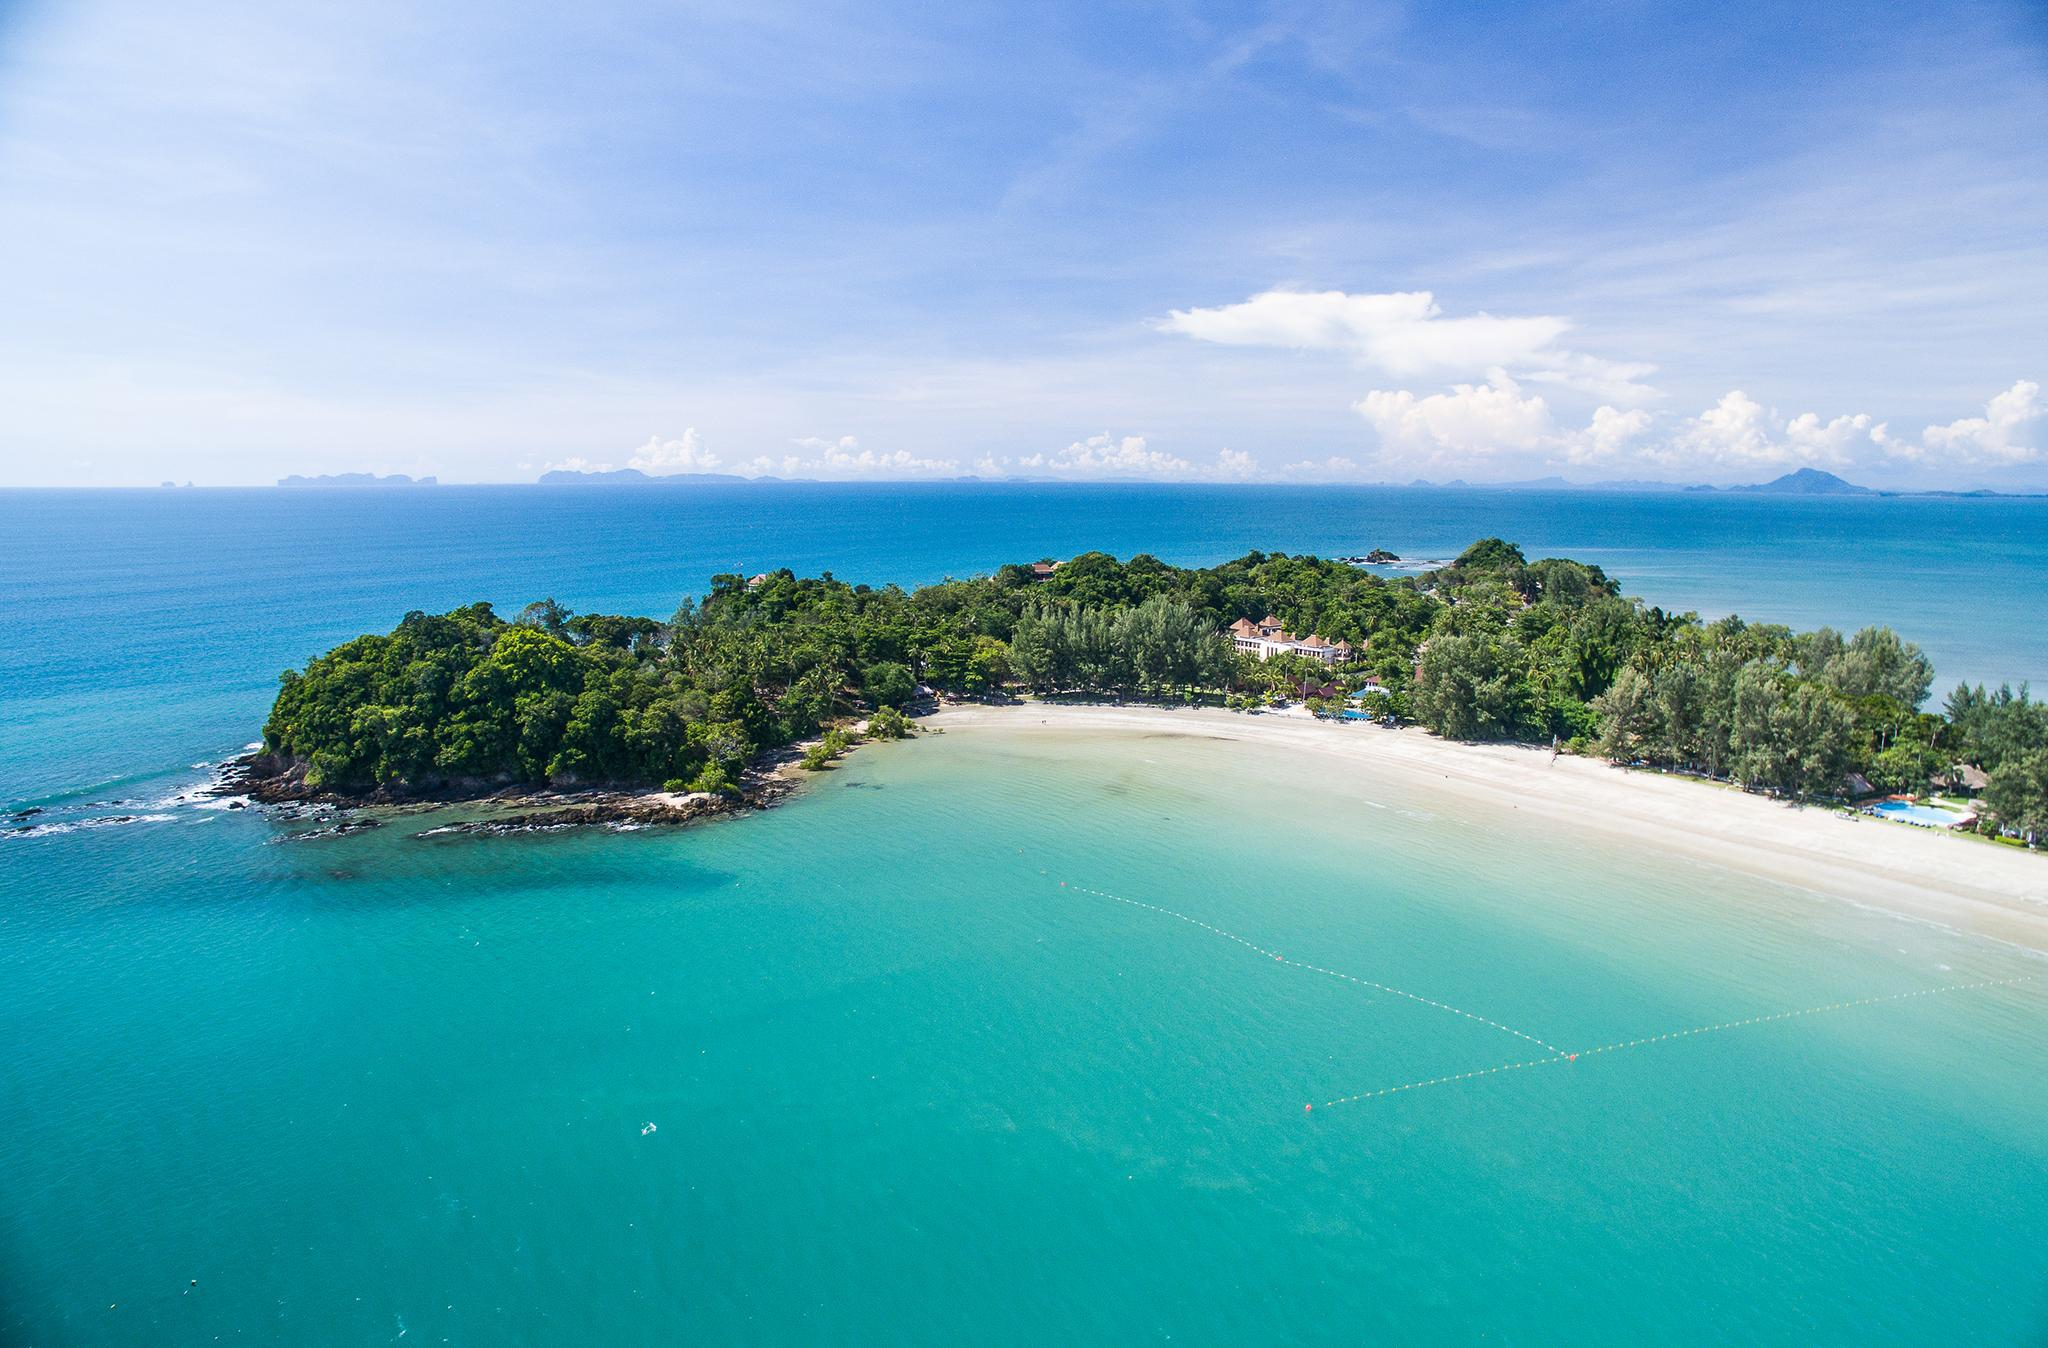 Kaw Kwang Beach Resort คอกวาง บีช รีสอร์ท